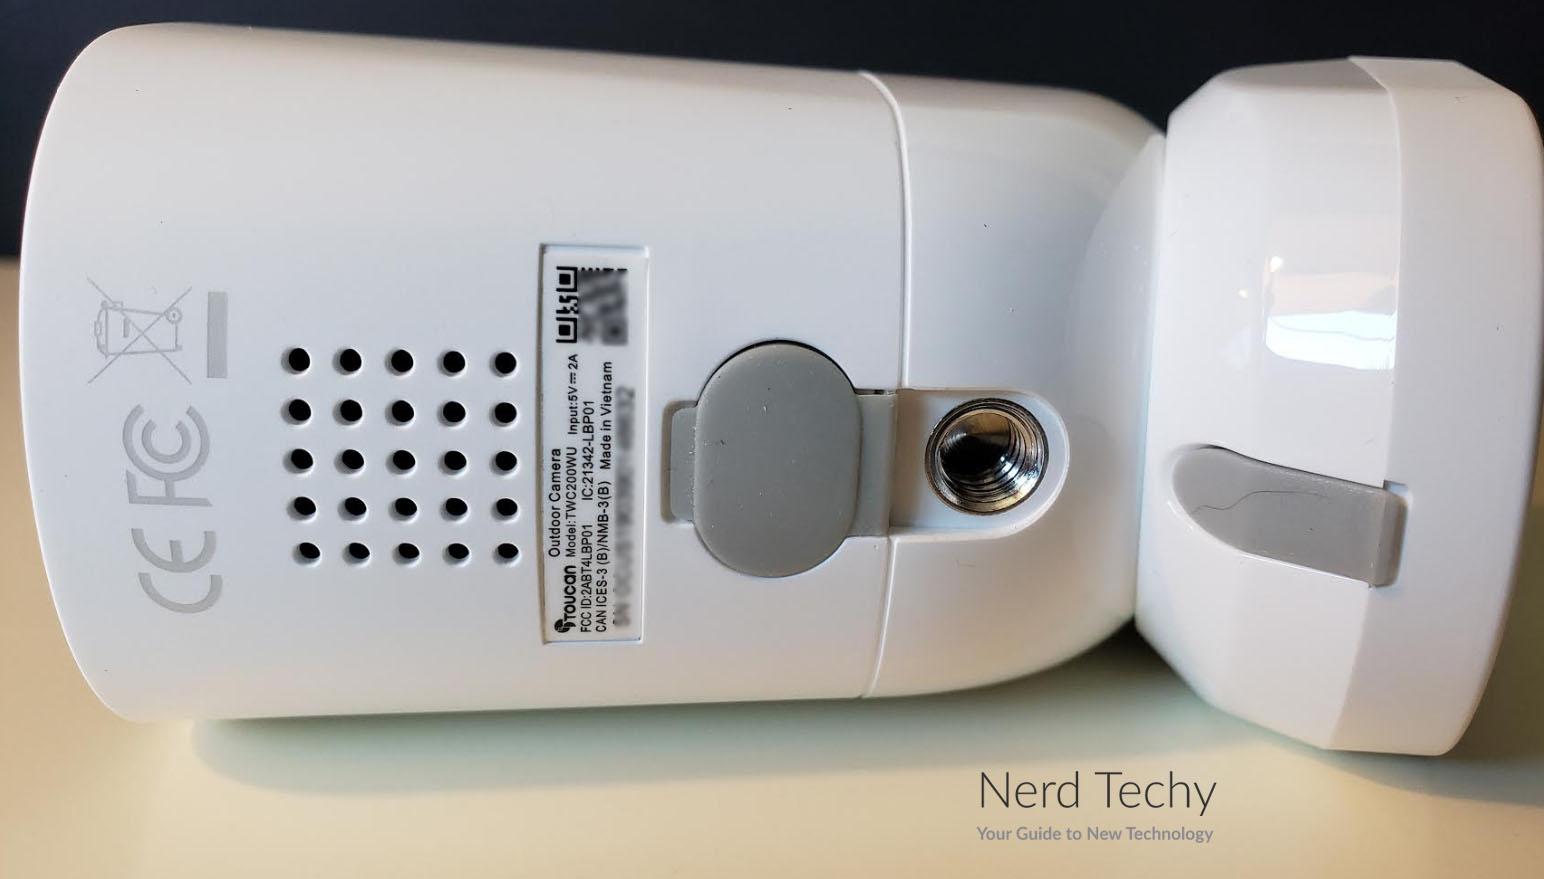 Toucan Wireless Outdoor Camera